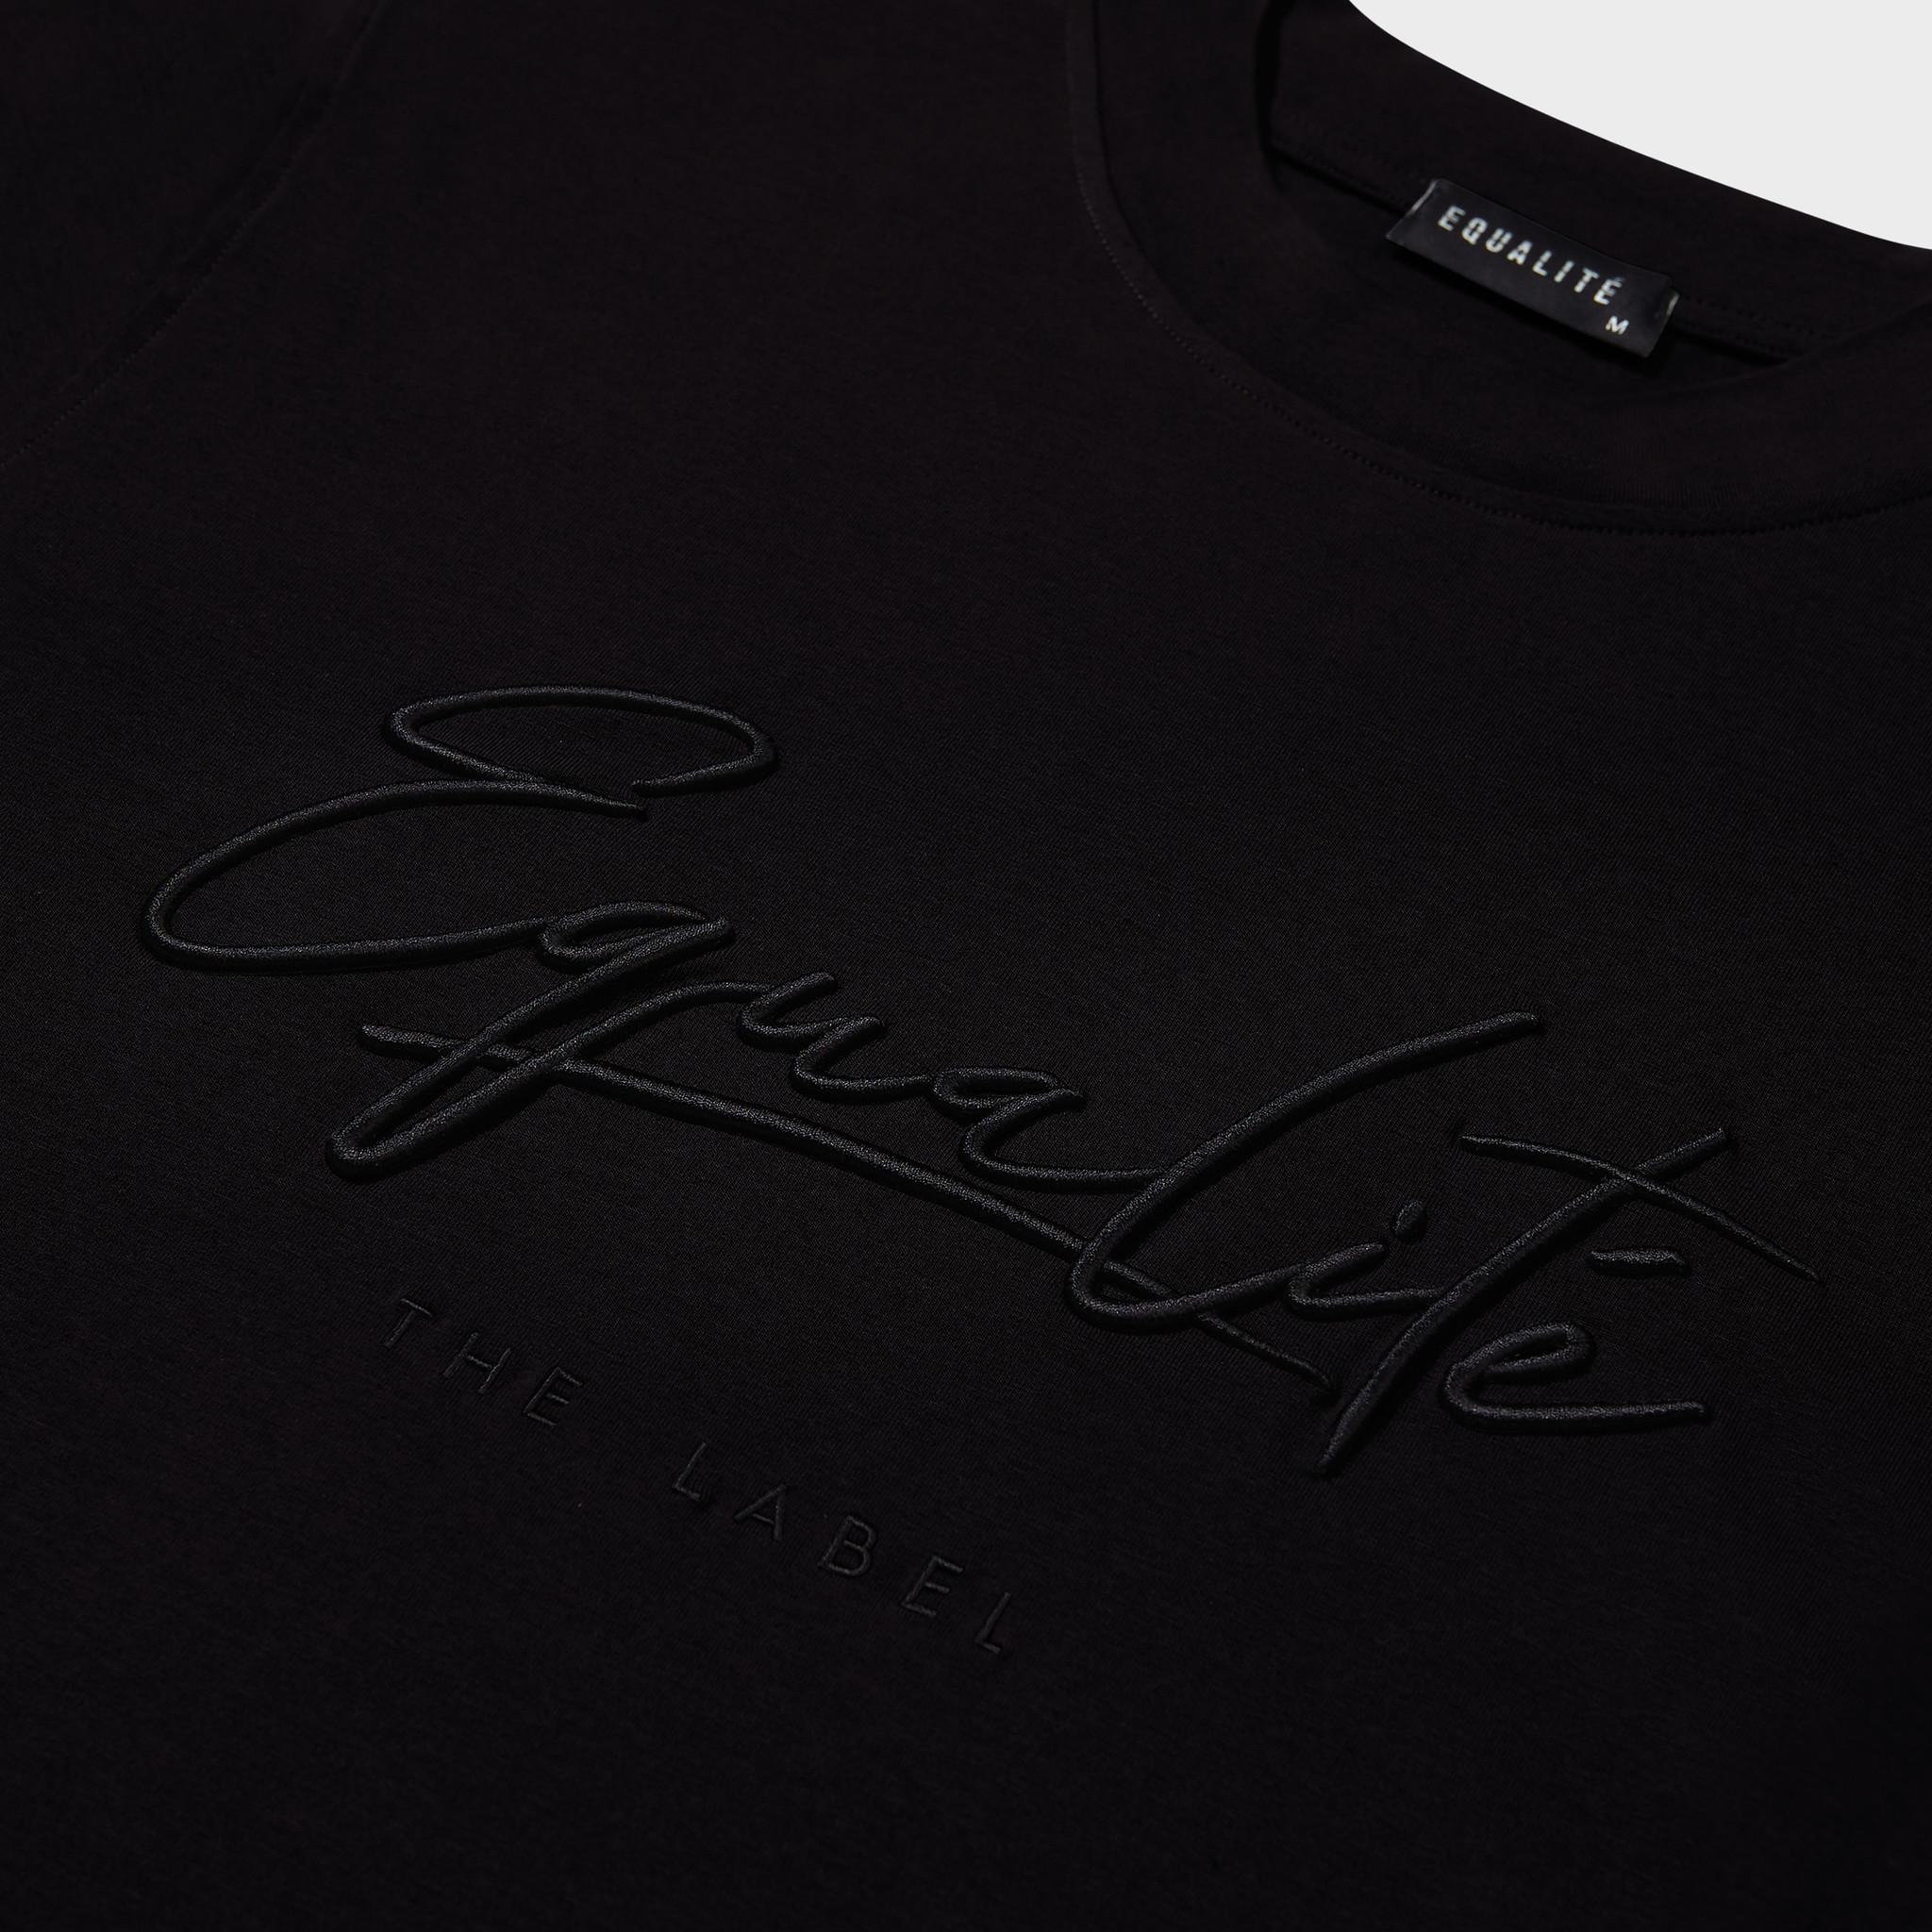 Wafi signature tee black & antra-3